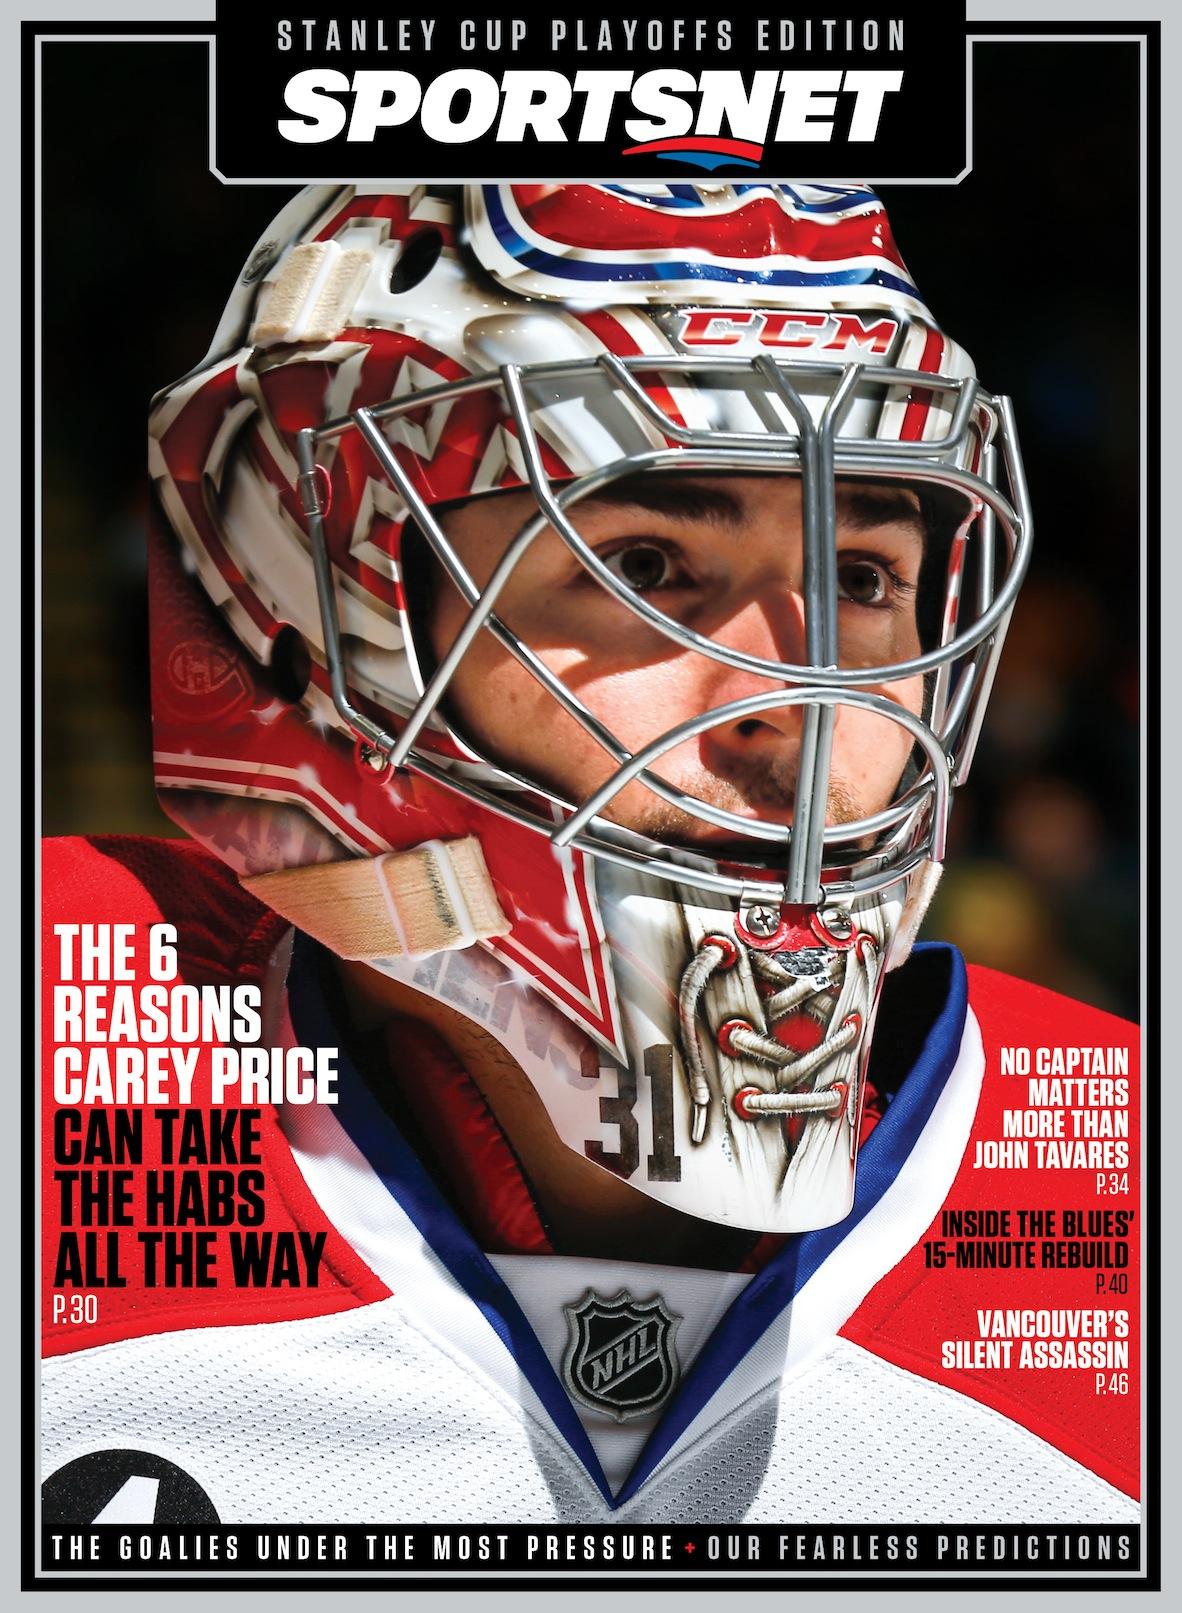 885fd03c9b7 Sportsnet Magazine - Previous Issues - Sportsnet.ca